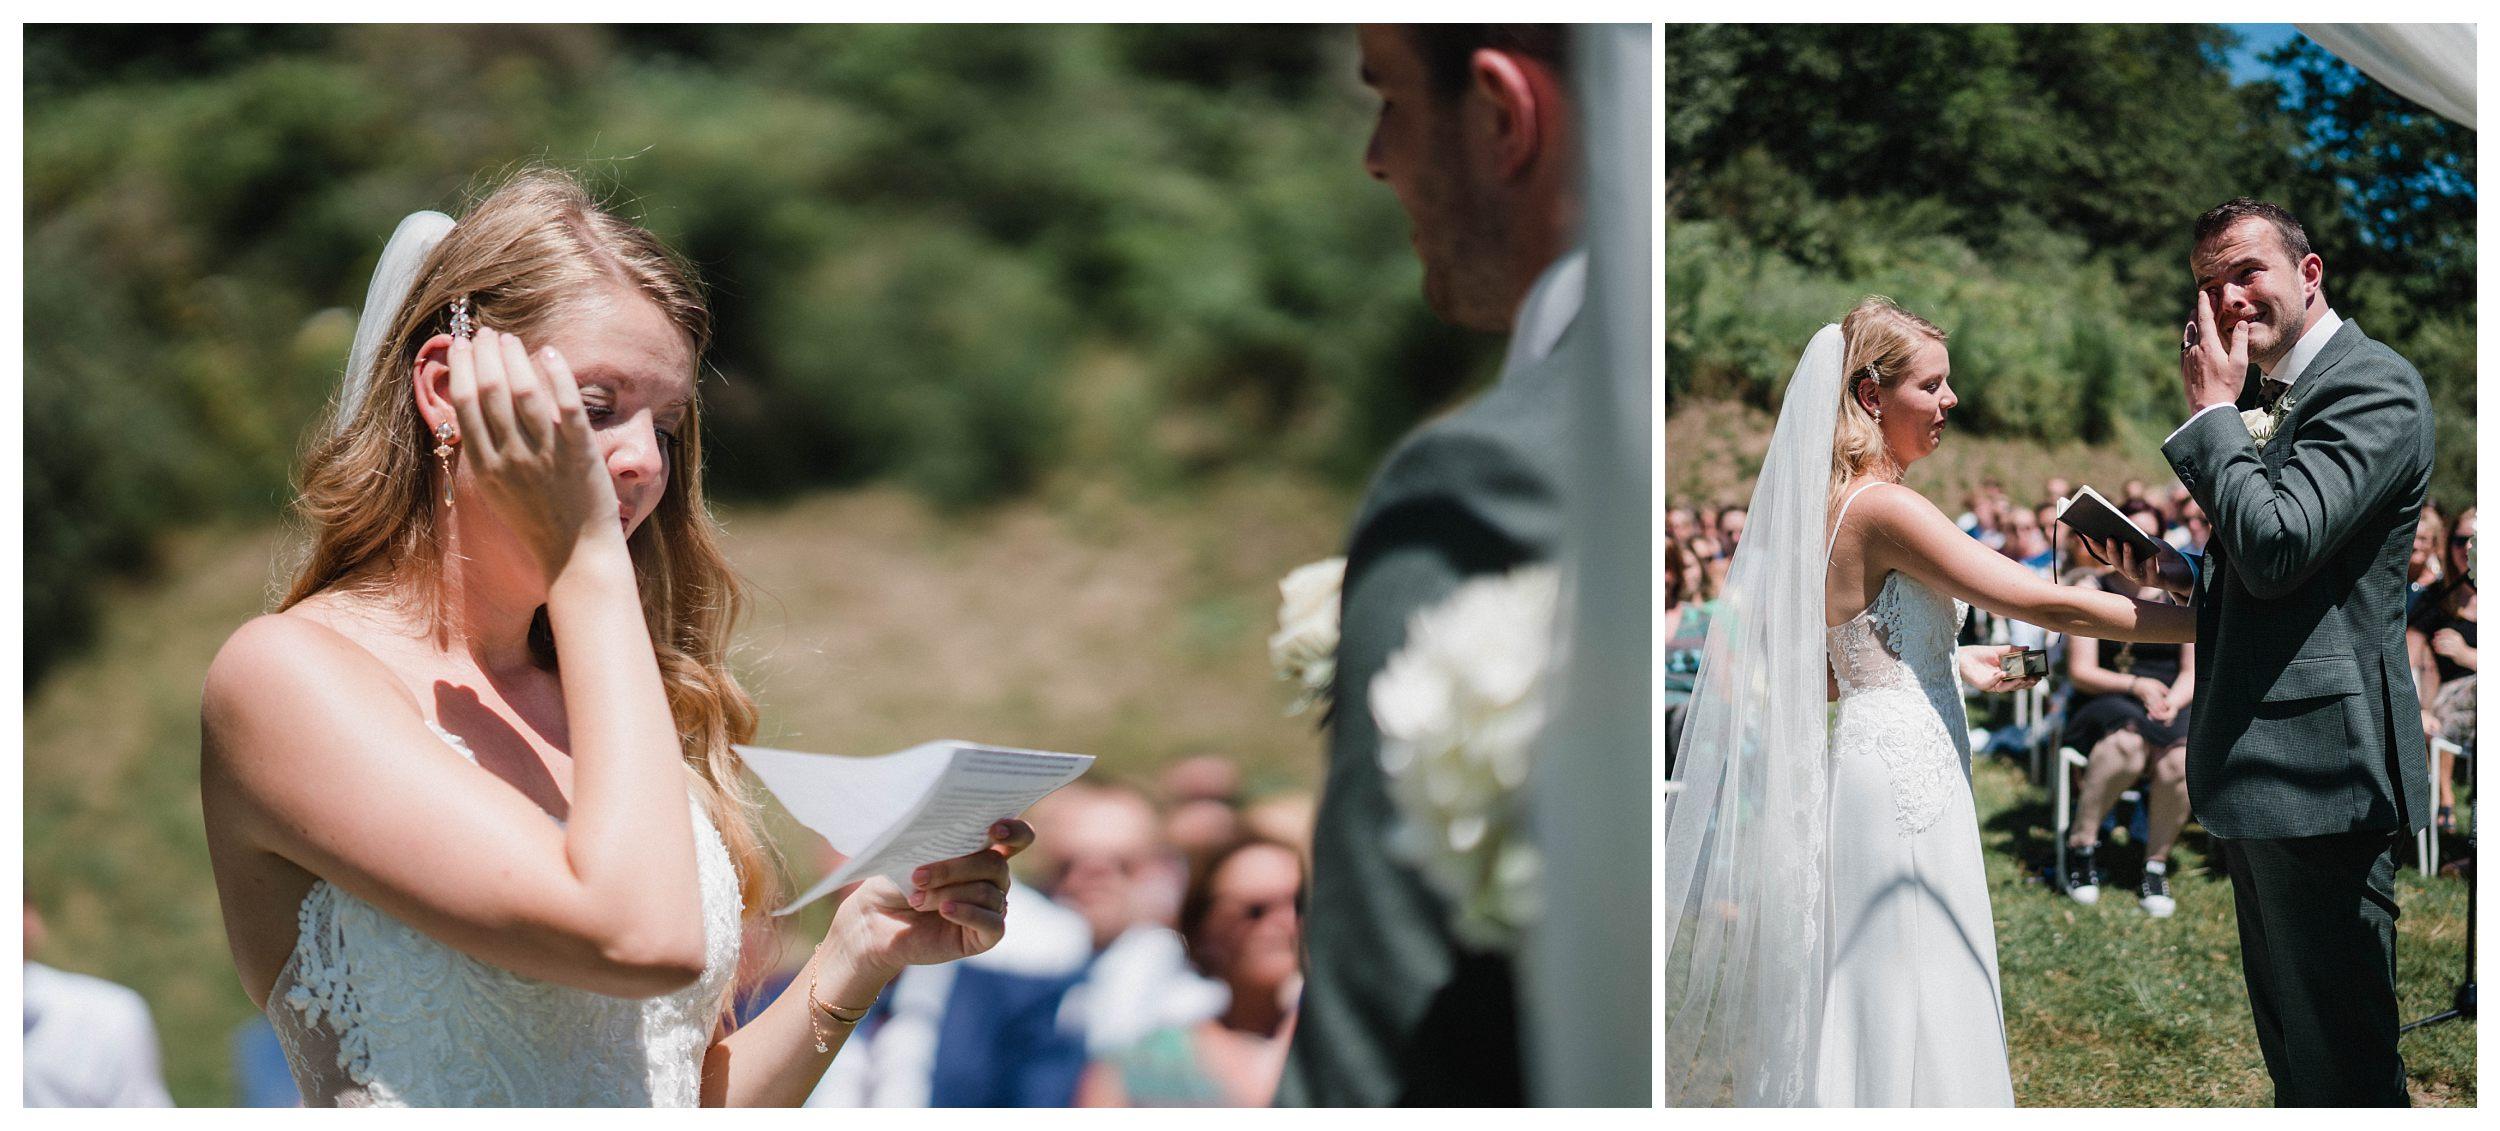 huwelijksfotograaf bruidsfotograaf destinationwedding huwelijksfotografie in ardennen nederland (67).jpg